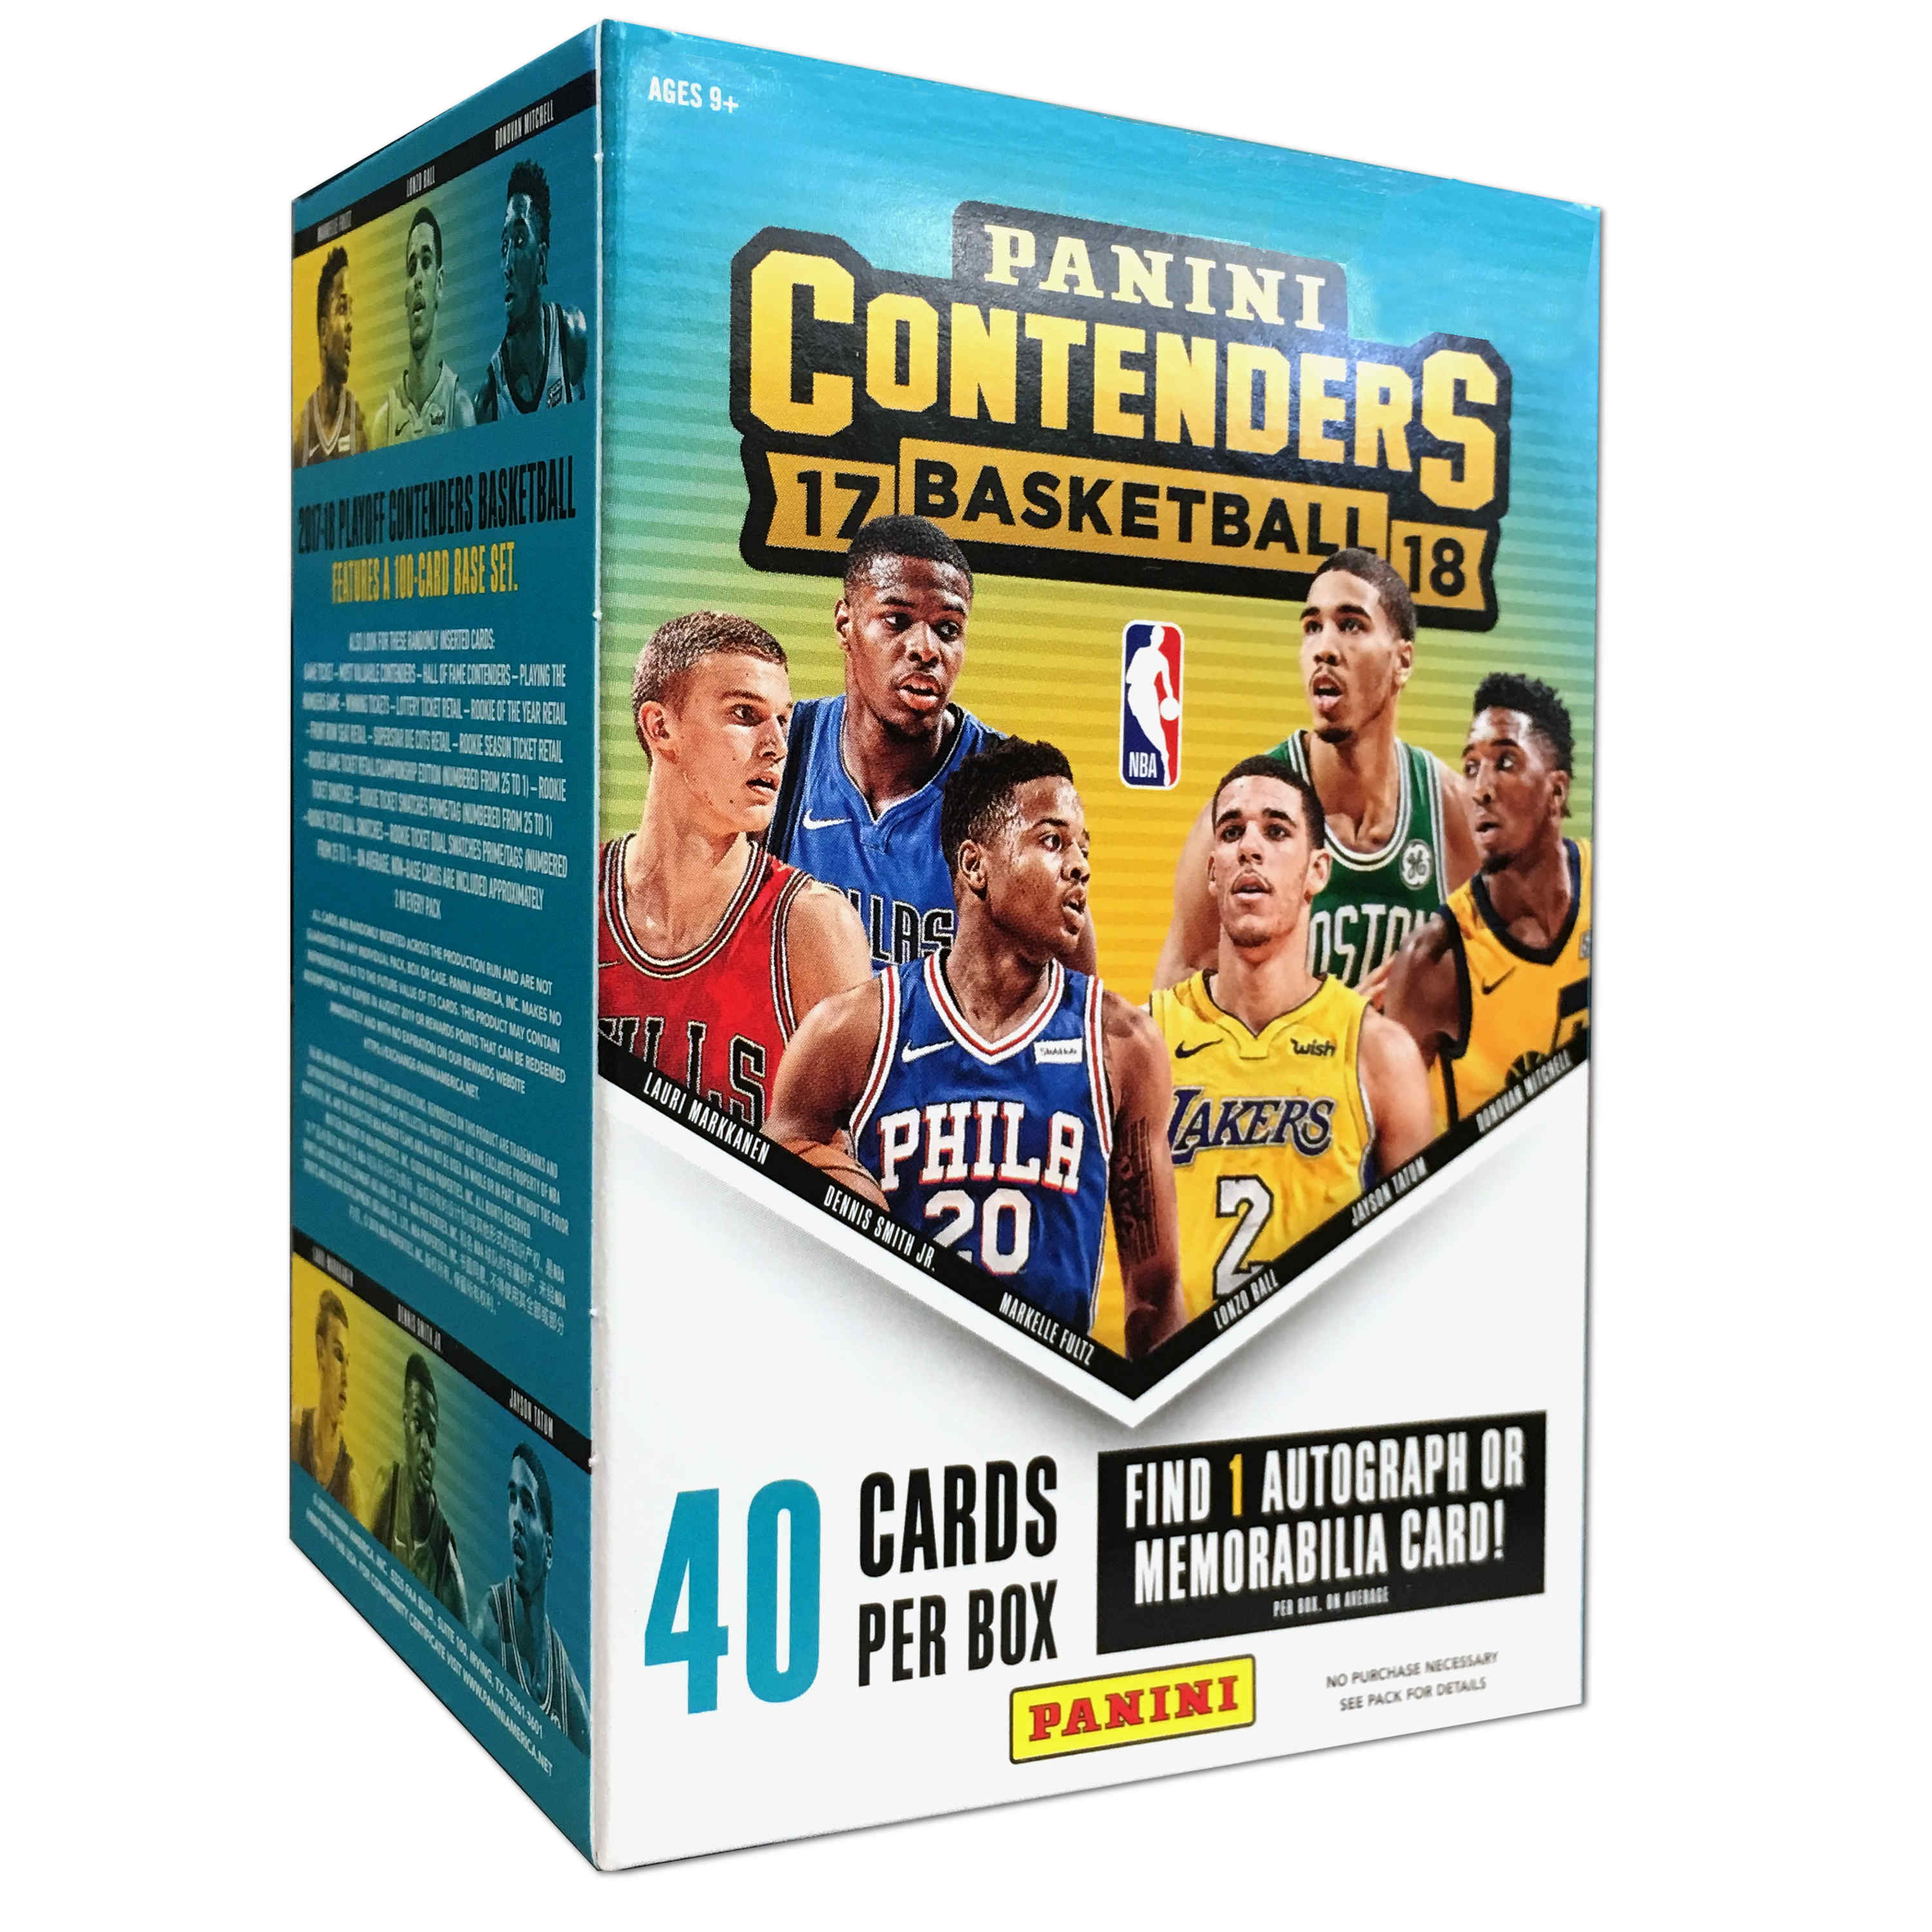 2017-18 Panini Contenders NBA Basketball Trading Cards Value Box by Panini